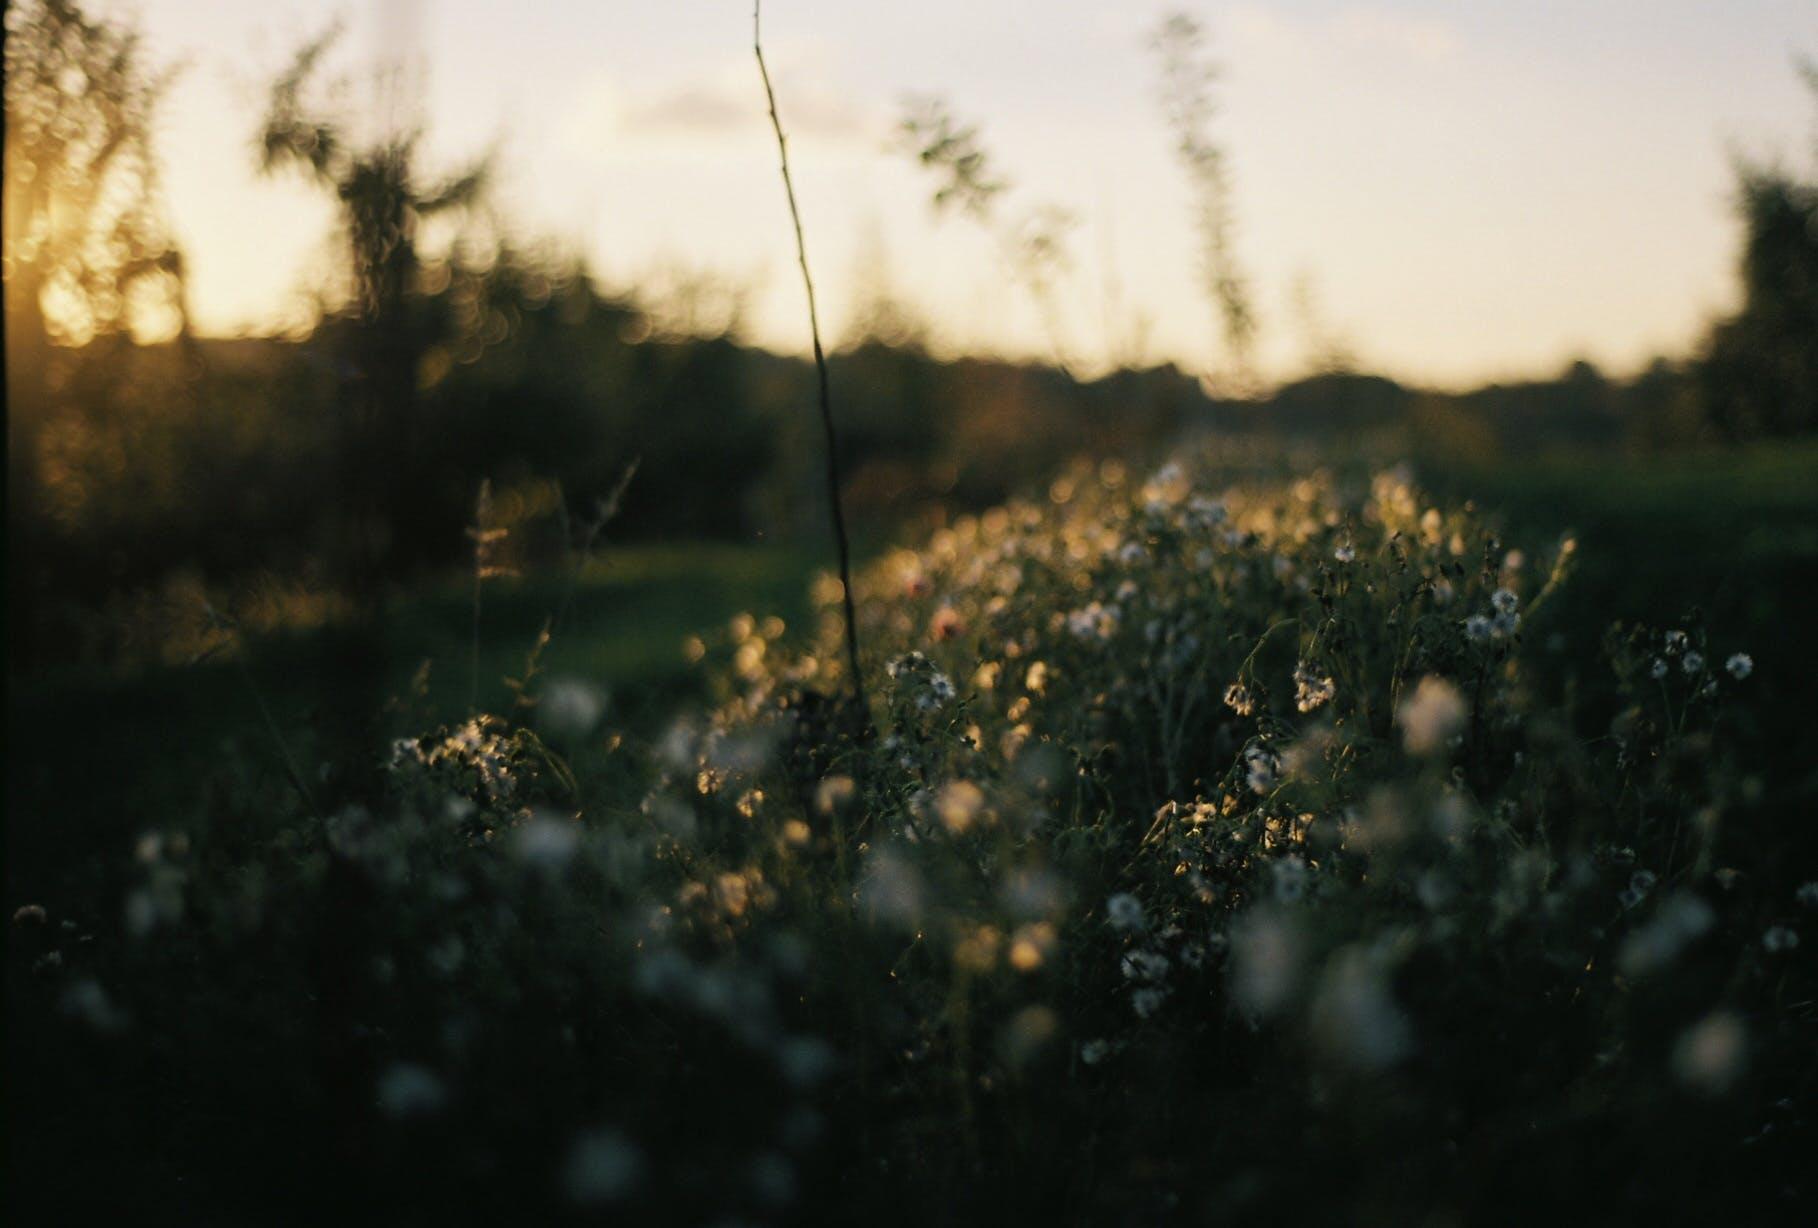 Free stock photo of nature, sunset, flowers, summer